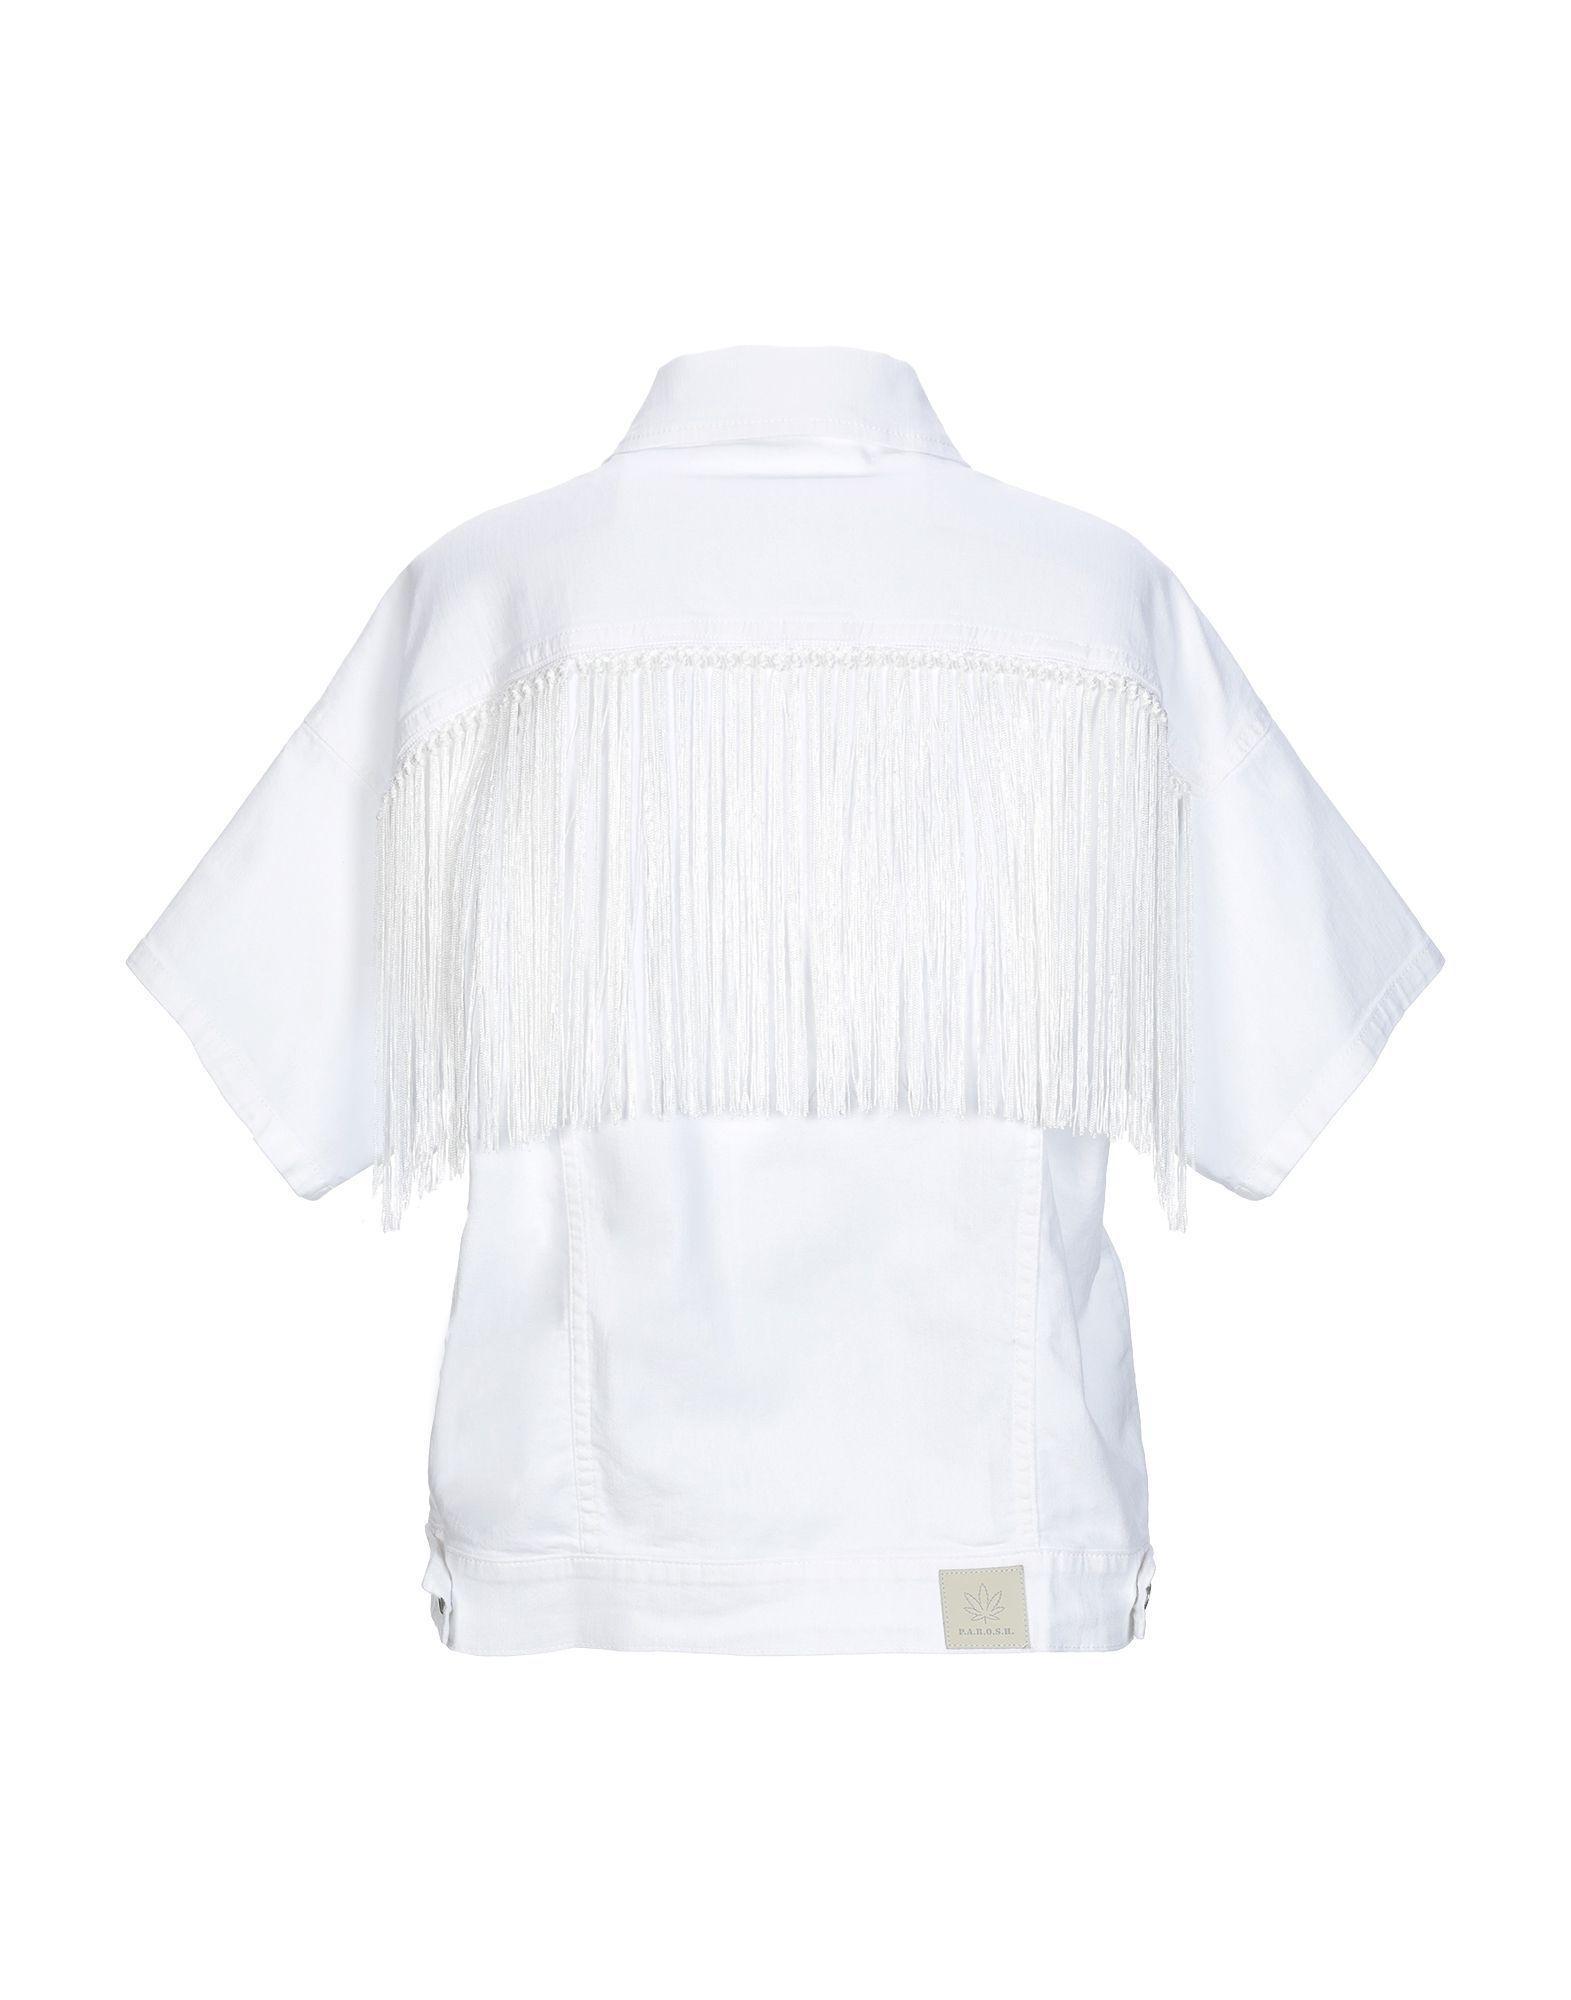 P.A.R.O.S.H. White Short Sleeve Denim Jacket